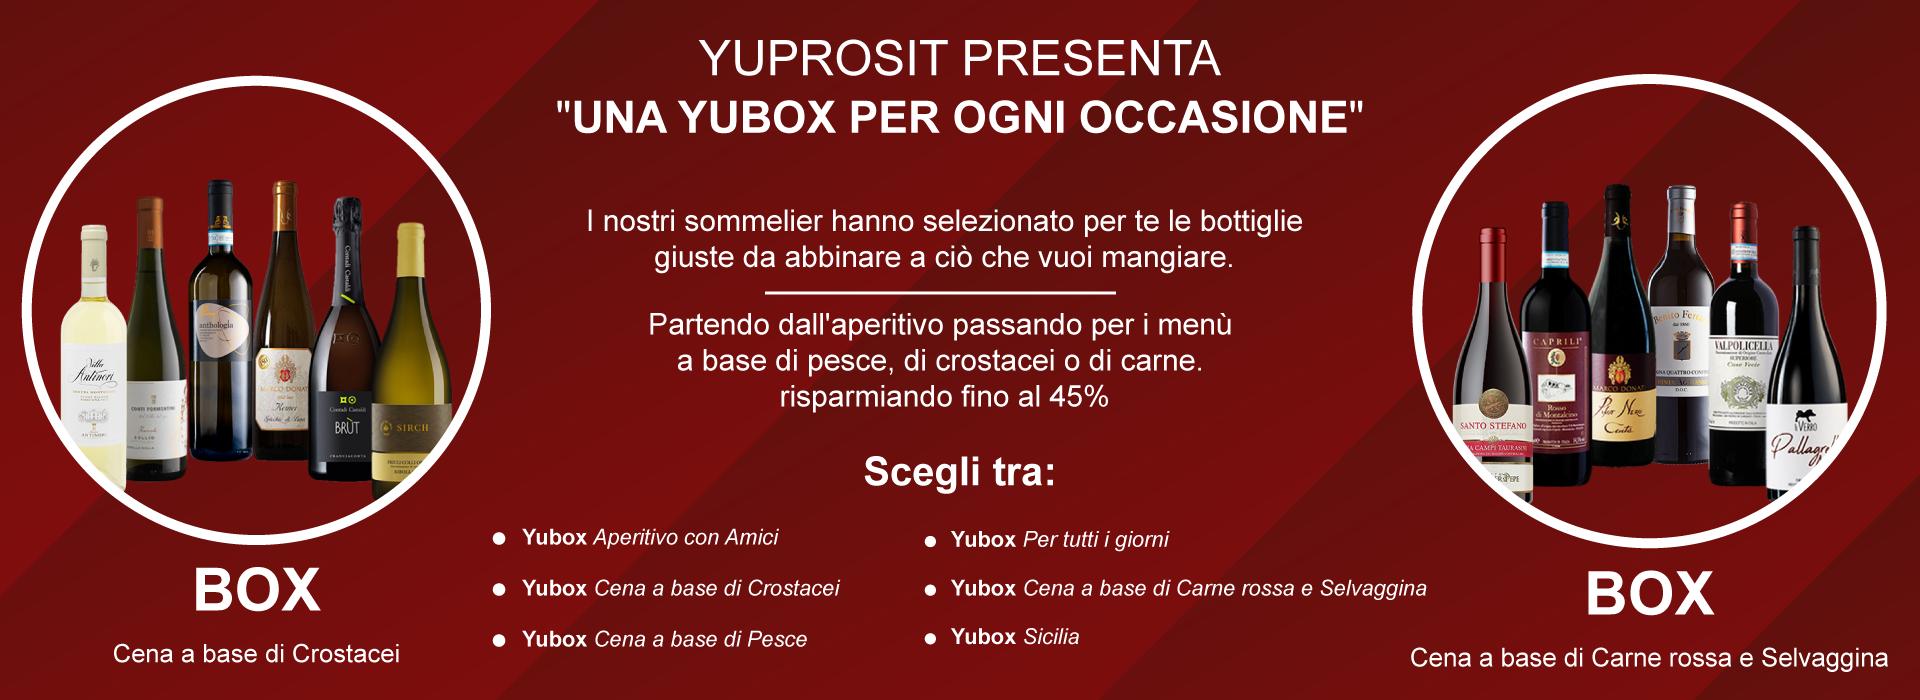 Nuove Box Yuprosit